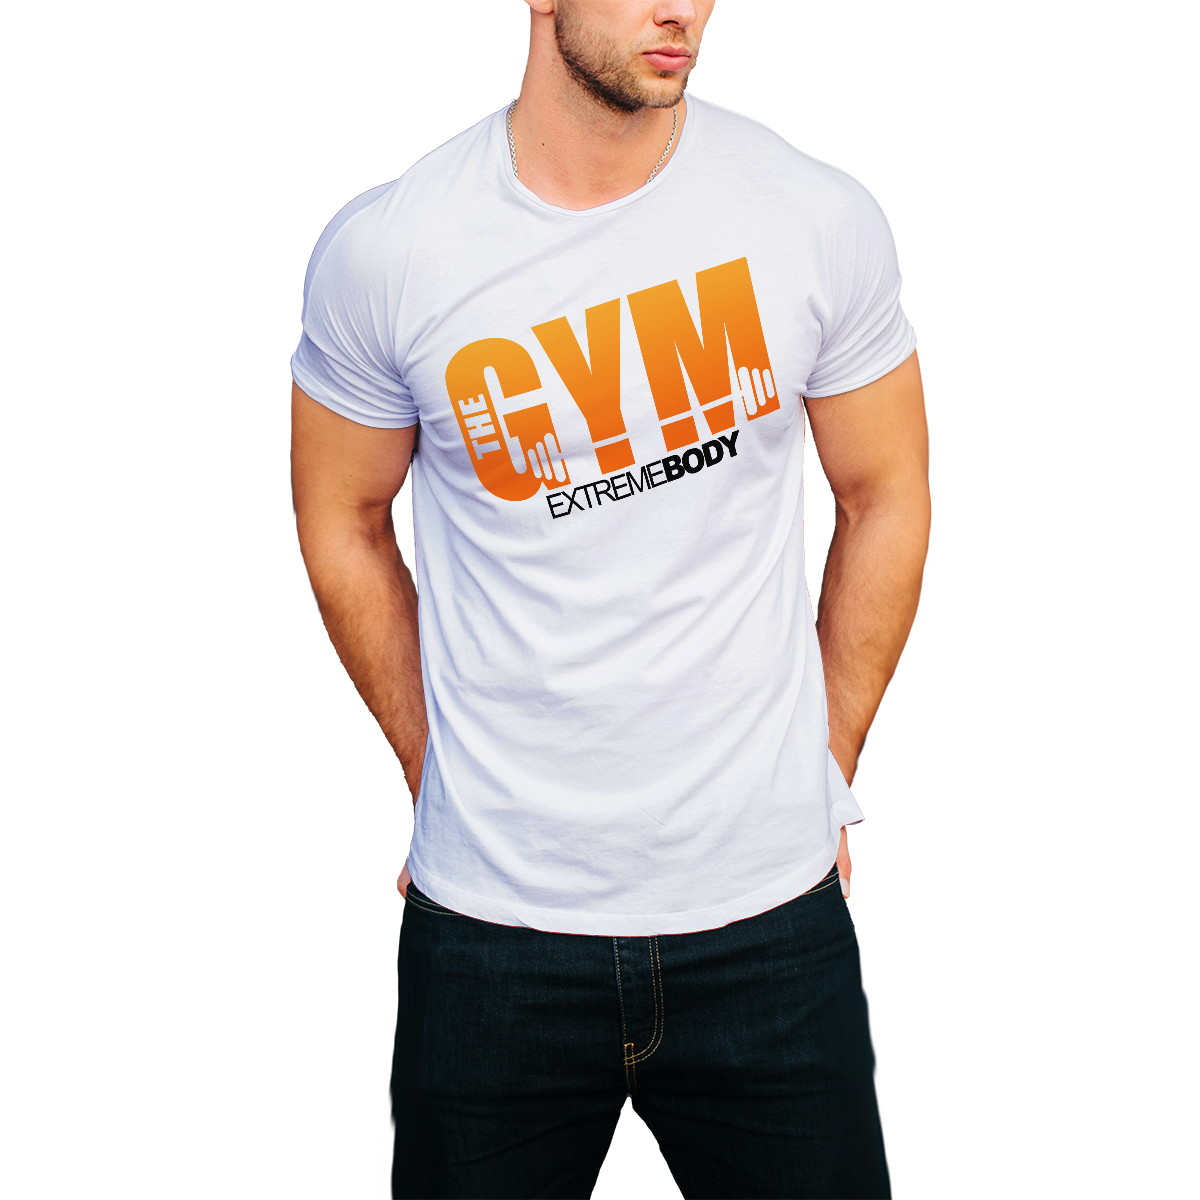 Camiseta Academia Treino Camisa Gym Esporte T-shirt BARATO no Elo7 ... b427fb4830b84